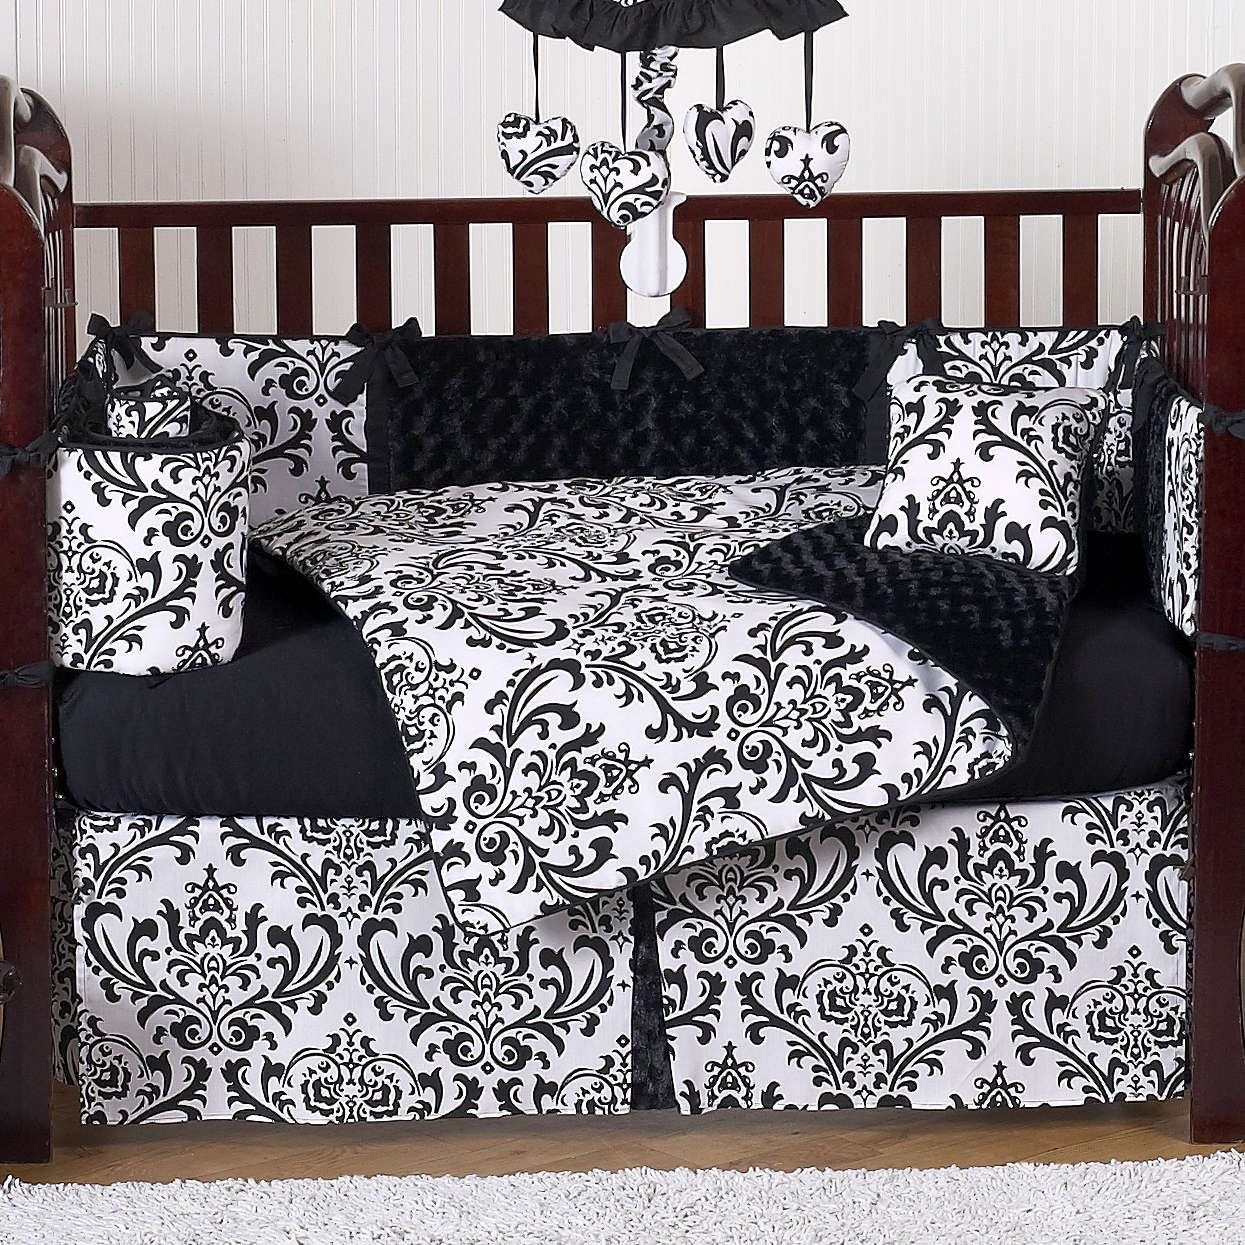 Best 25 White Crib Bedding Ideas On Pinterest Princess